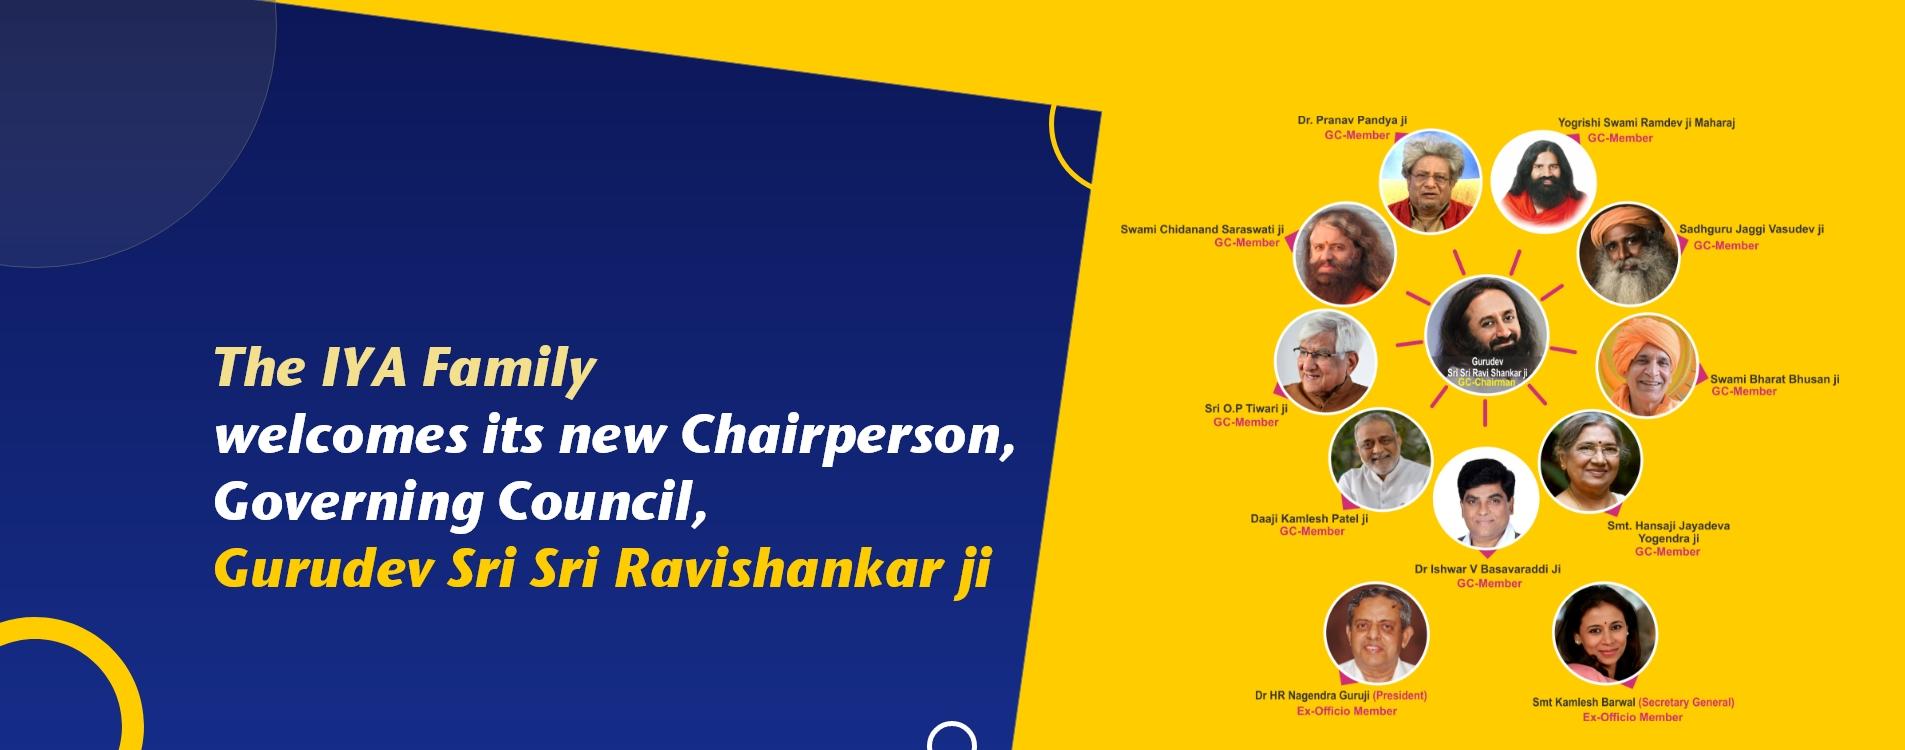 GC-Chairperson-Gurudev-Sri-Sri-Ravishankar-ji